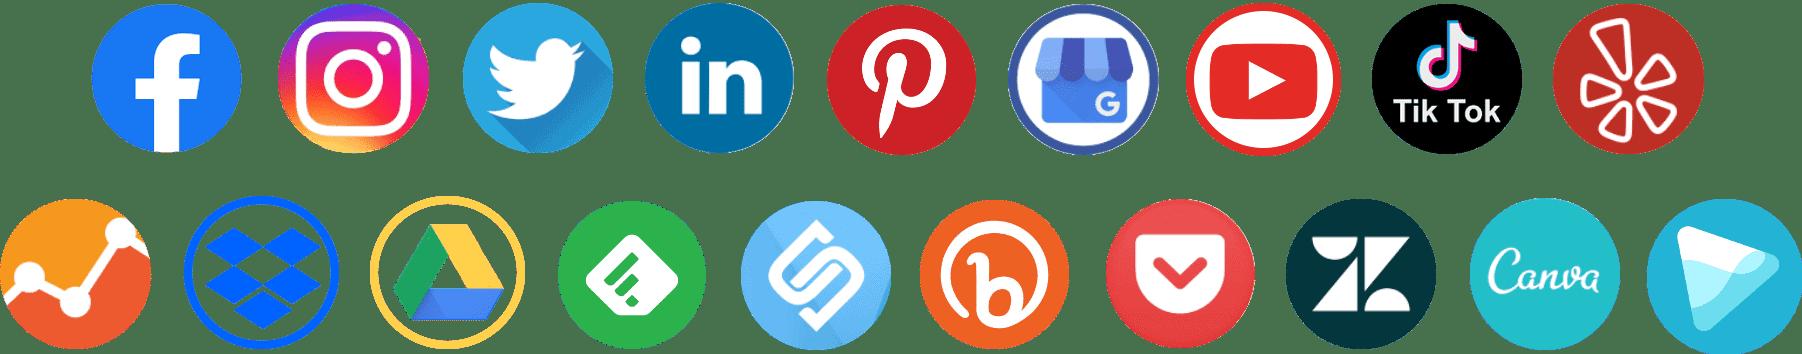 social media round icons